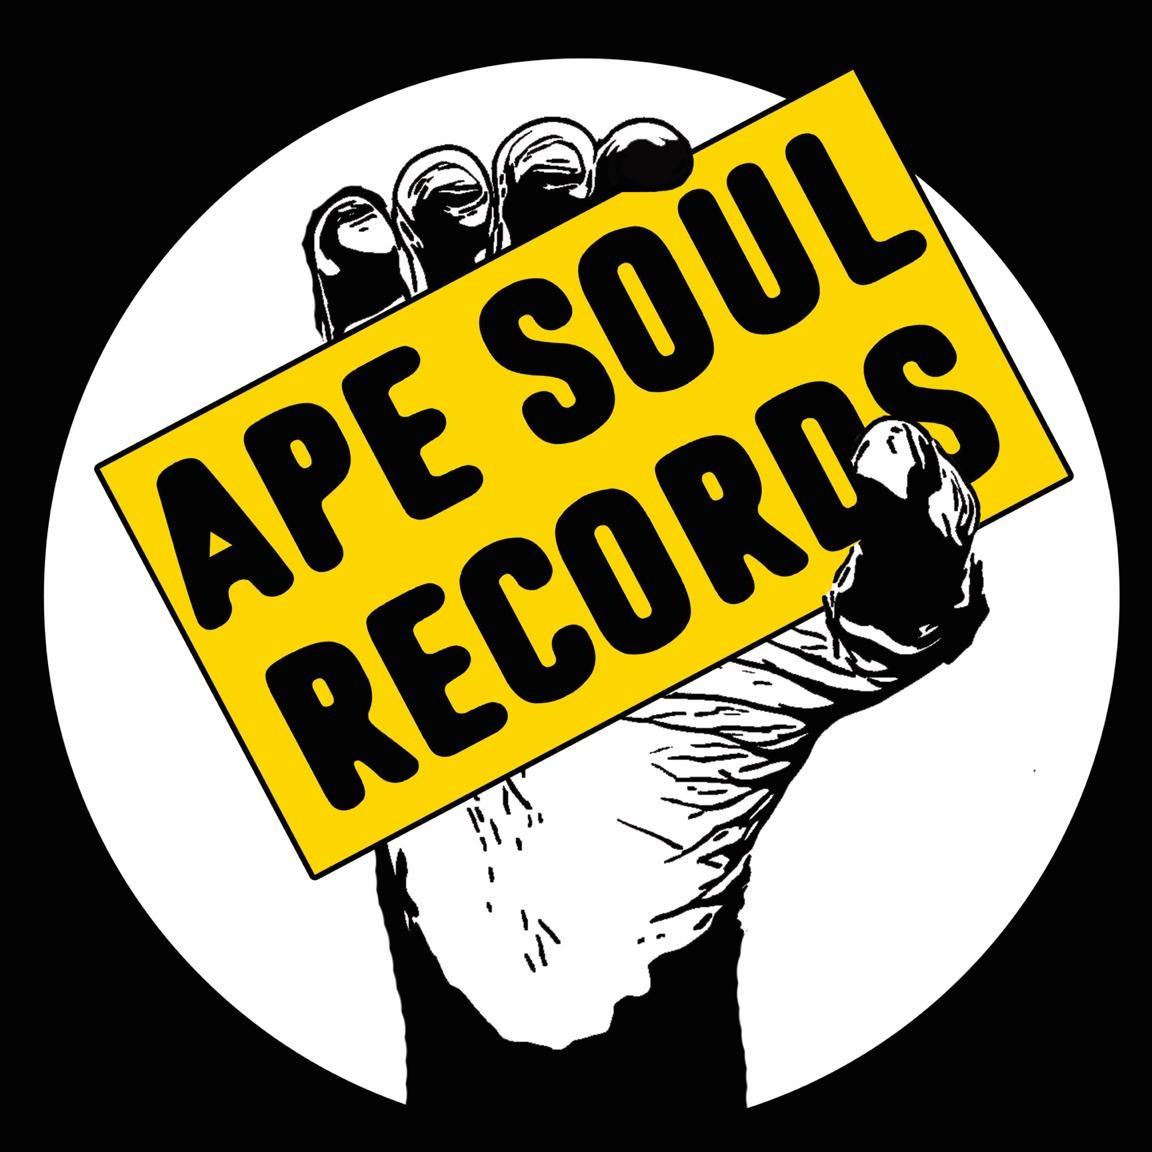 @recordsapesoul Profile Image | Linktree